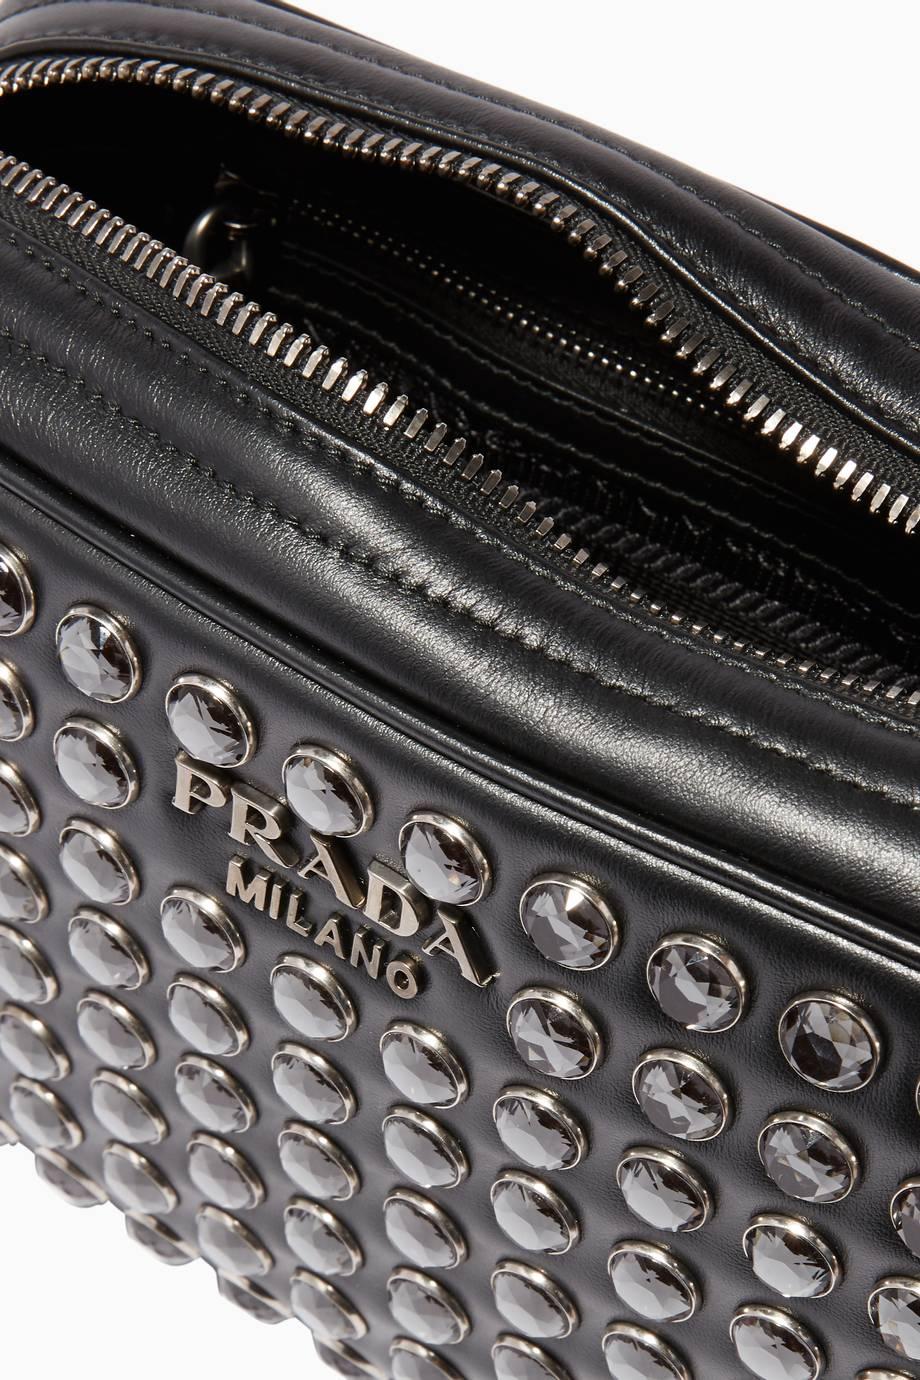 57c889b7ca056 تسوق حقيبة كروس داياجرام جلد بكريستال سوداء من برادا